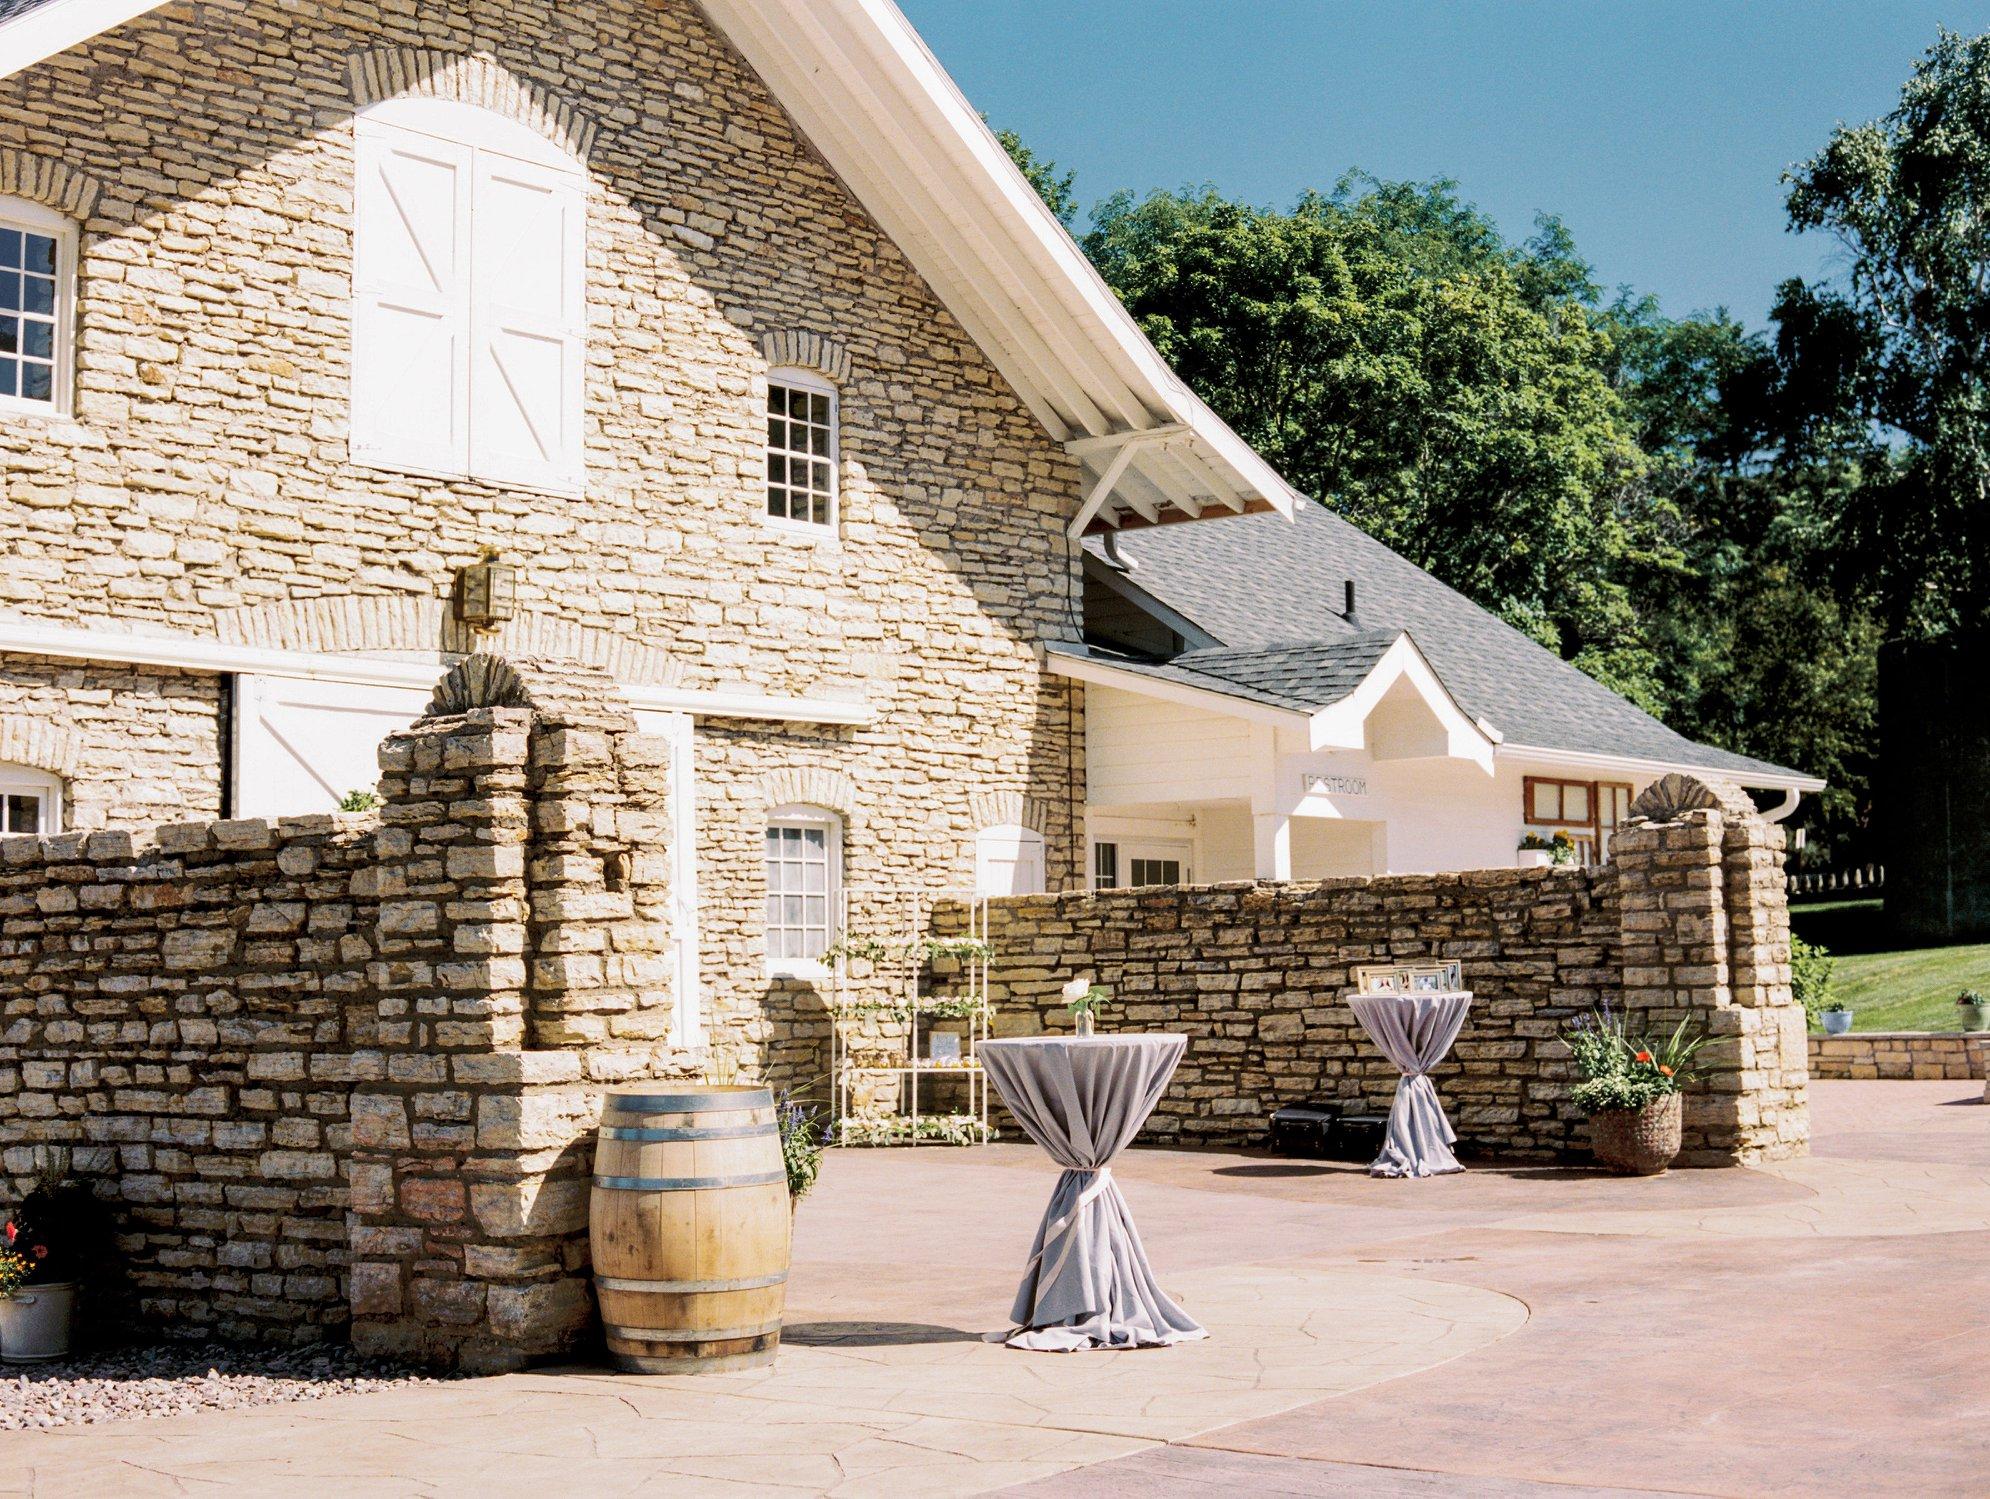 Mayowood-Stone-Barn-Rochester-MN.jpg